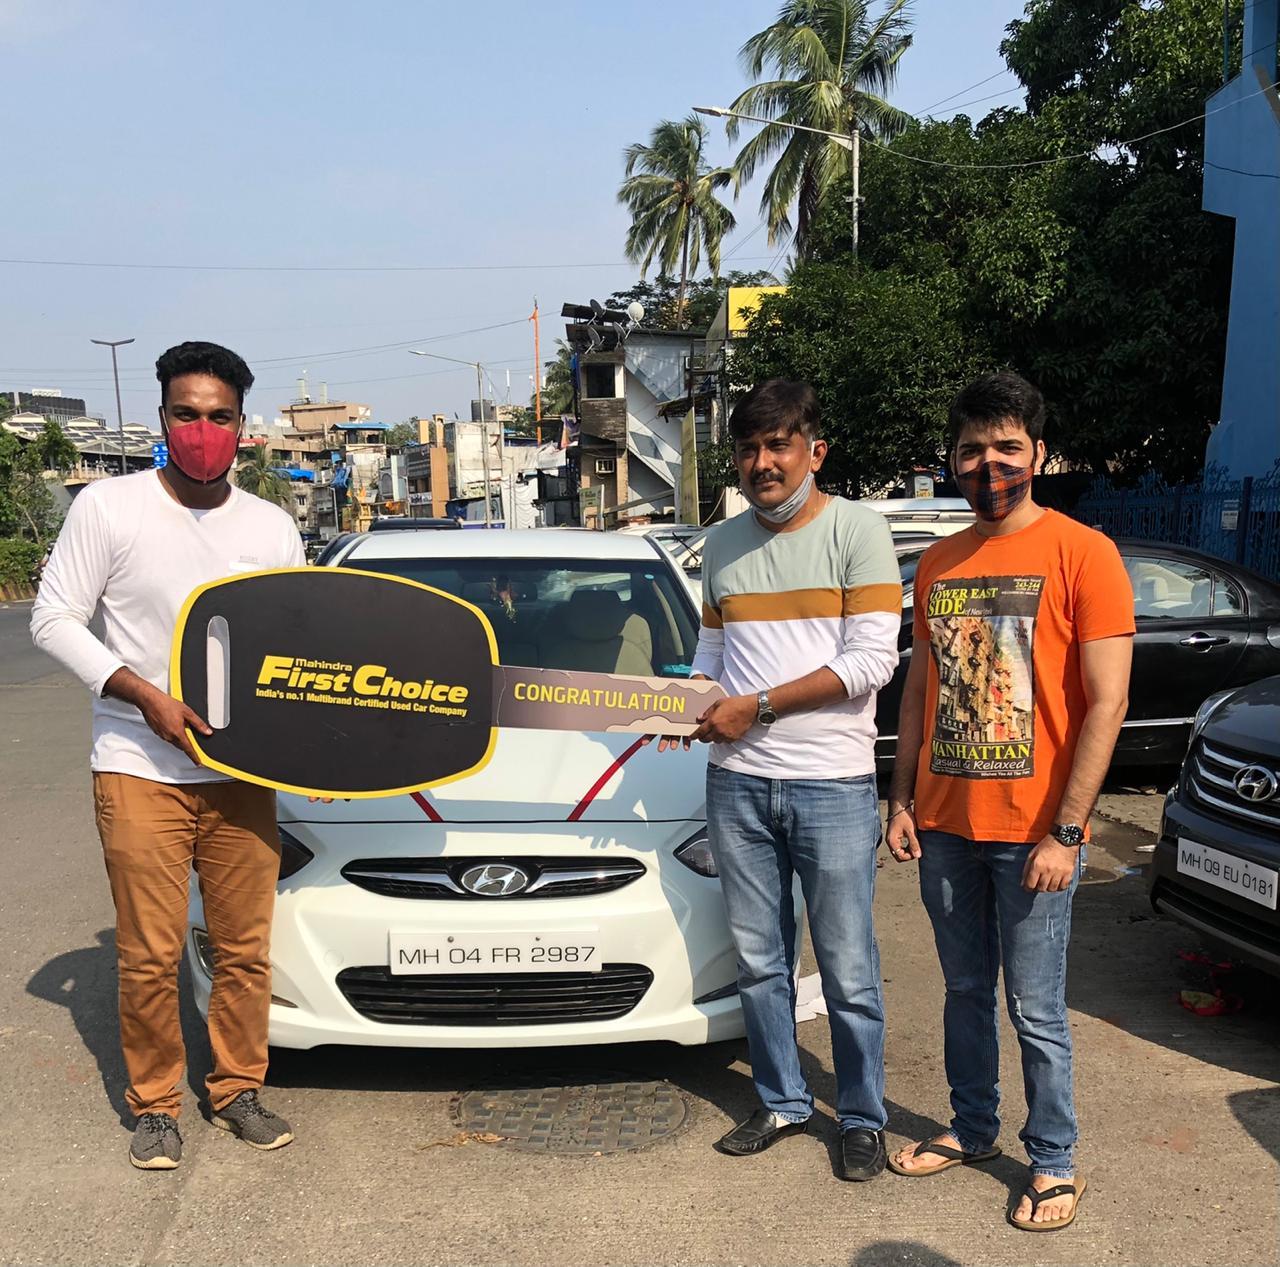 mahindra-first-choice-second-hand-cars-5